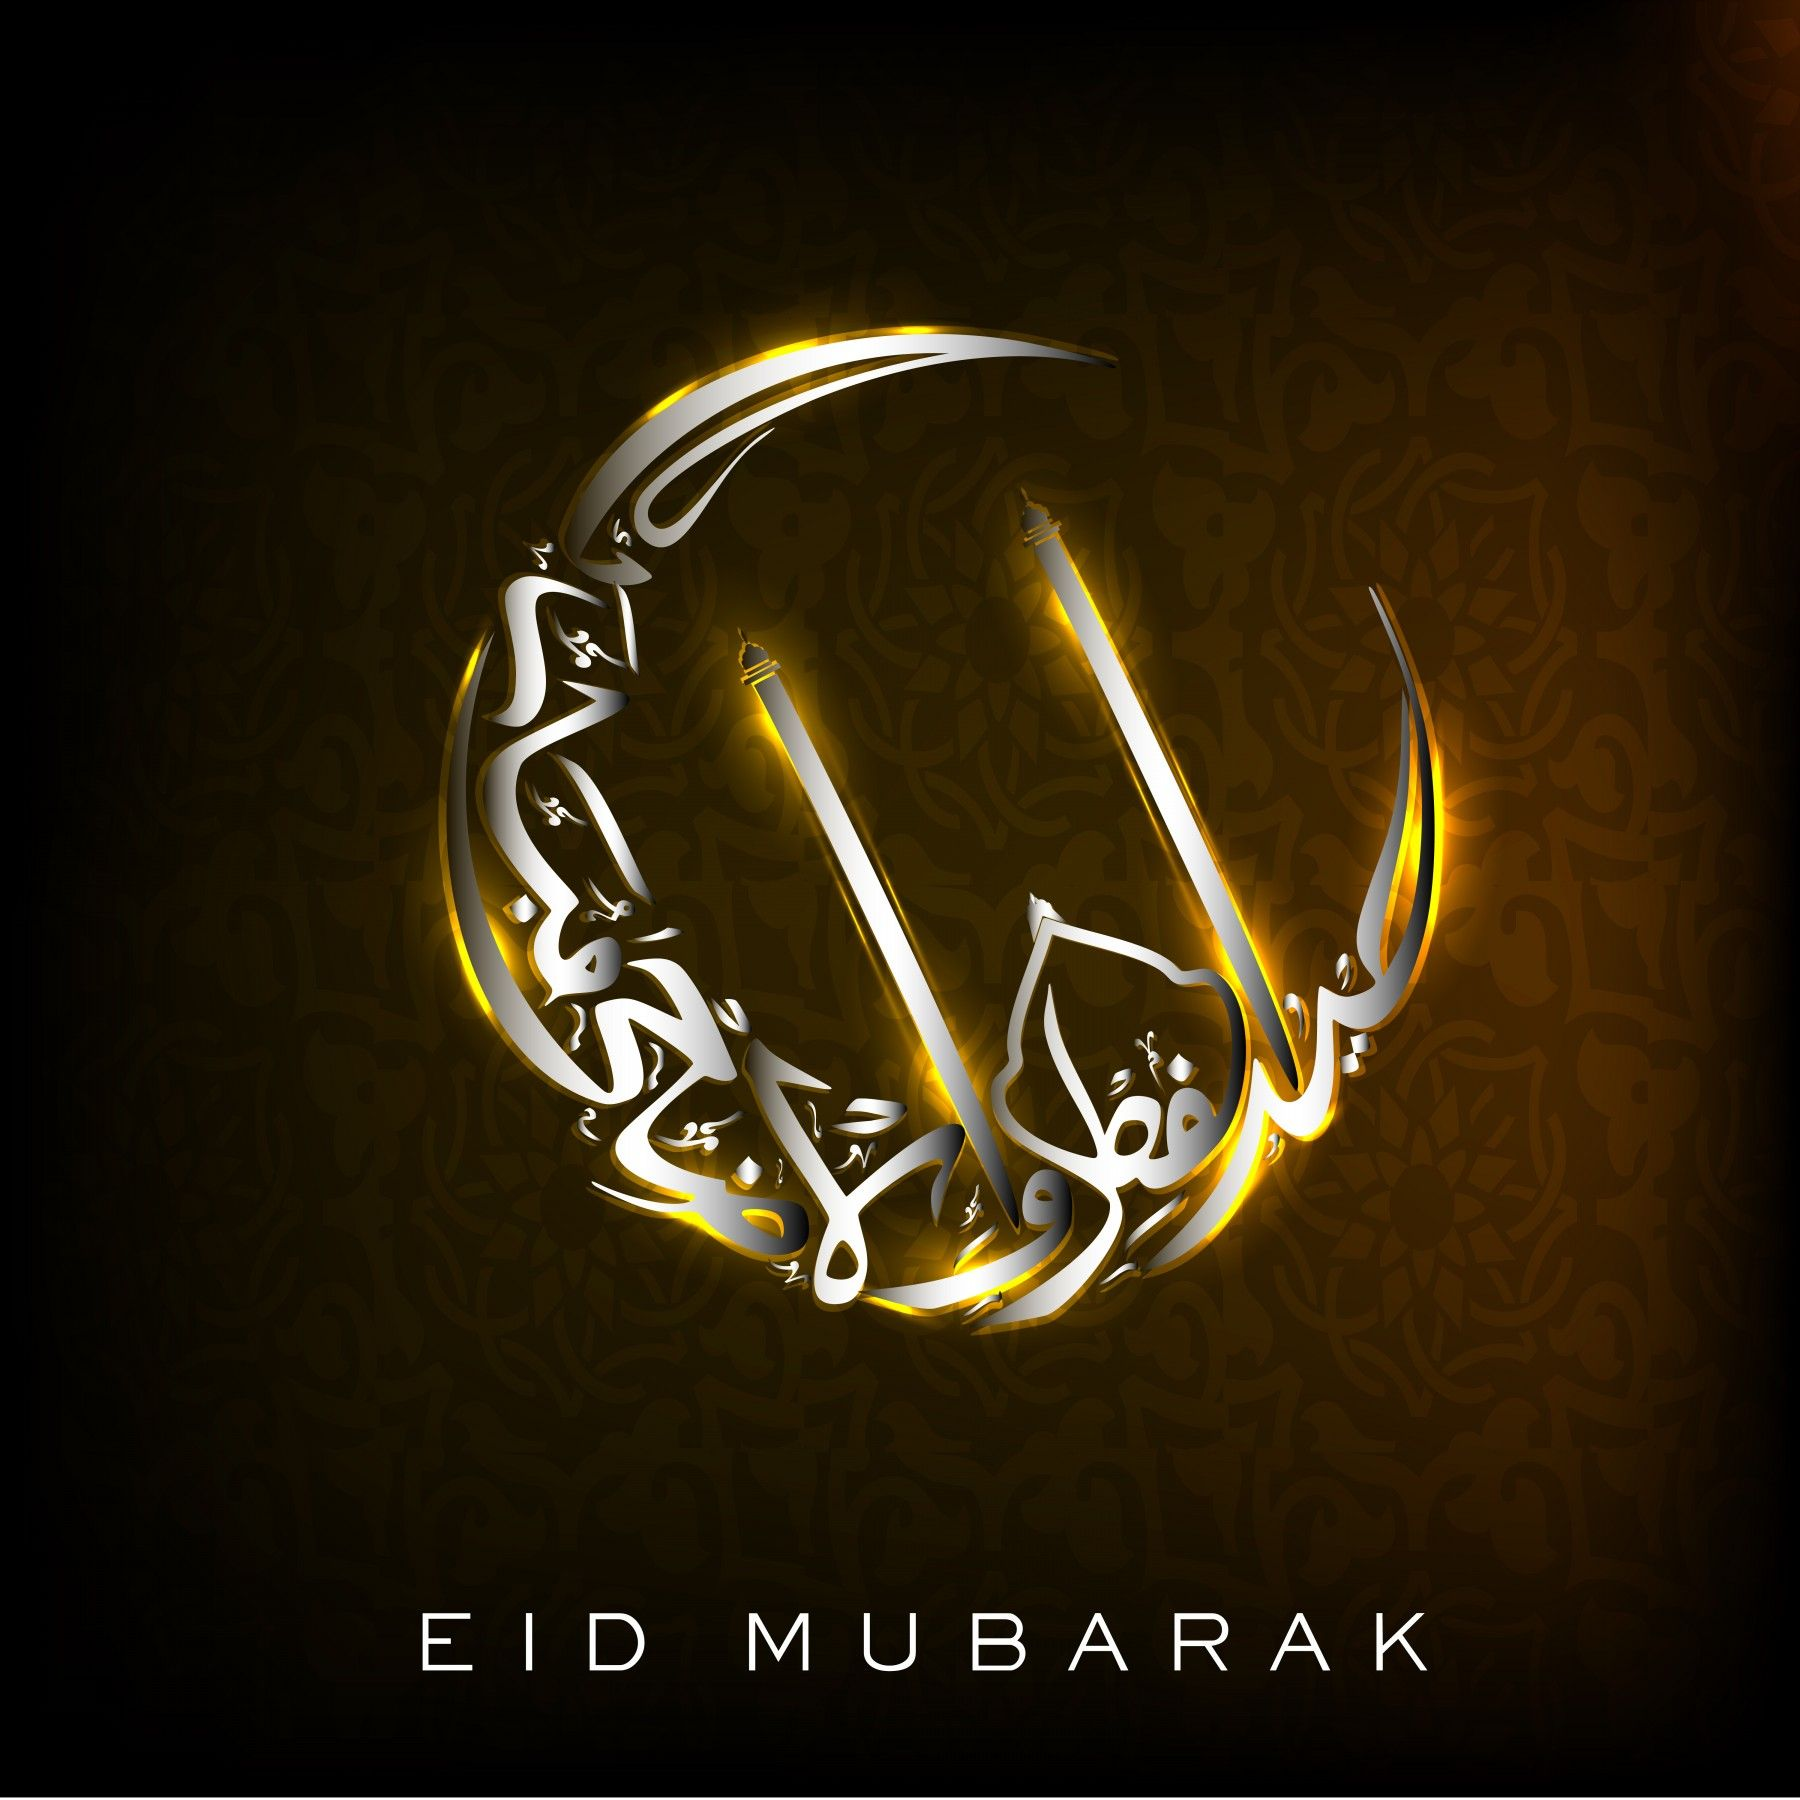 How Muslims Observe Eid Al-Adha, The Feast Of Sacrifice